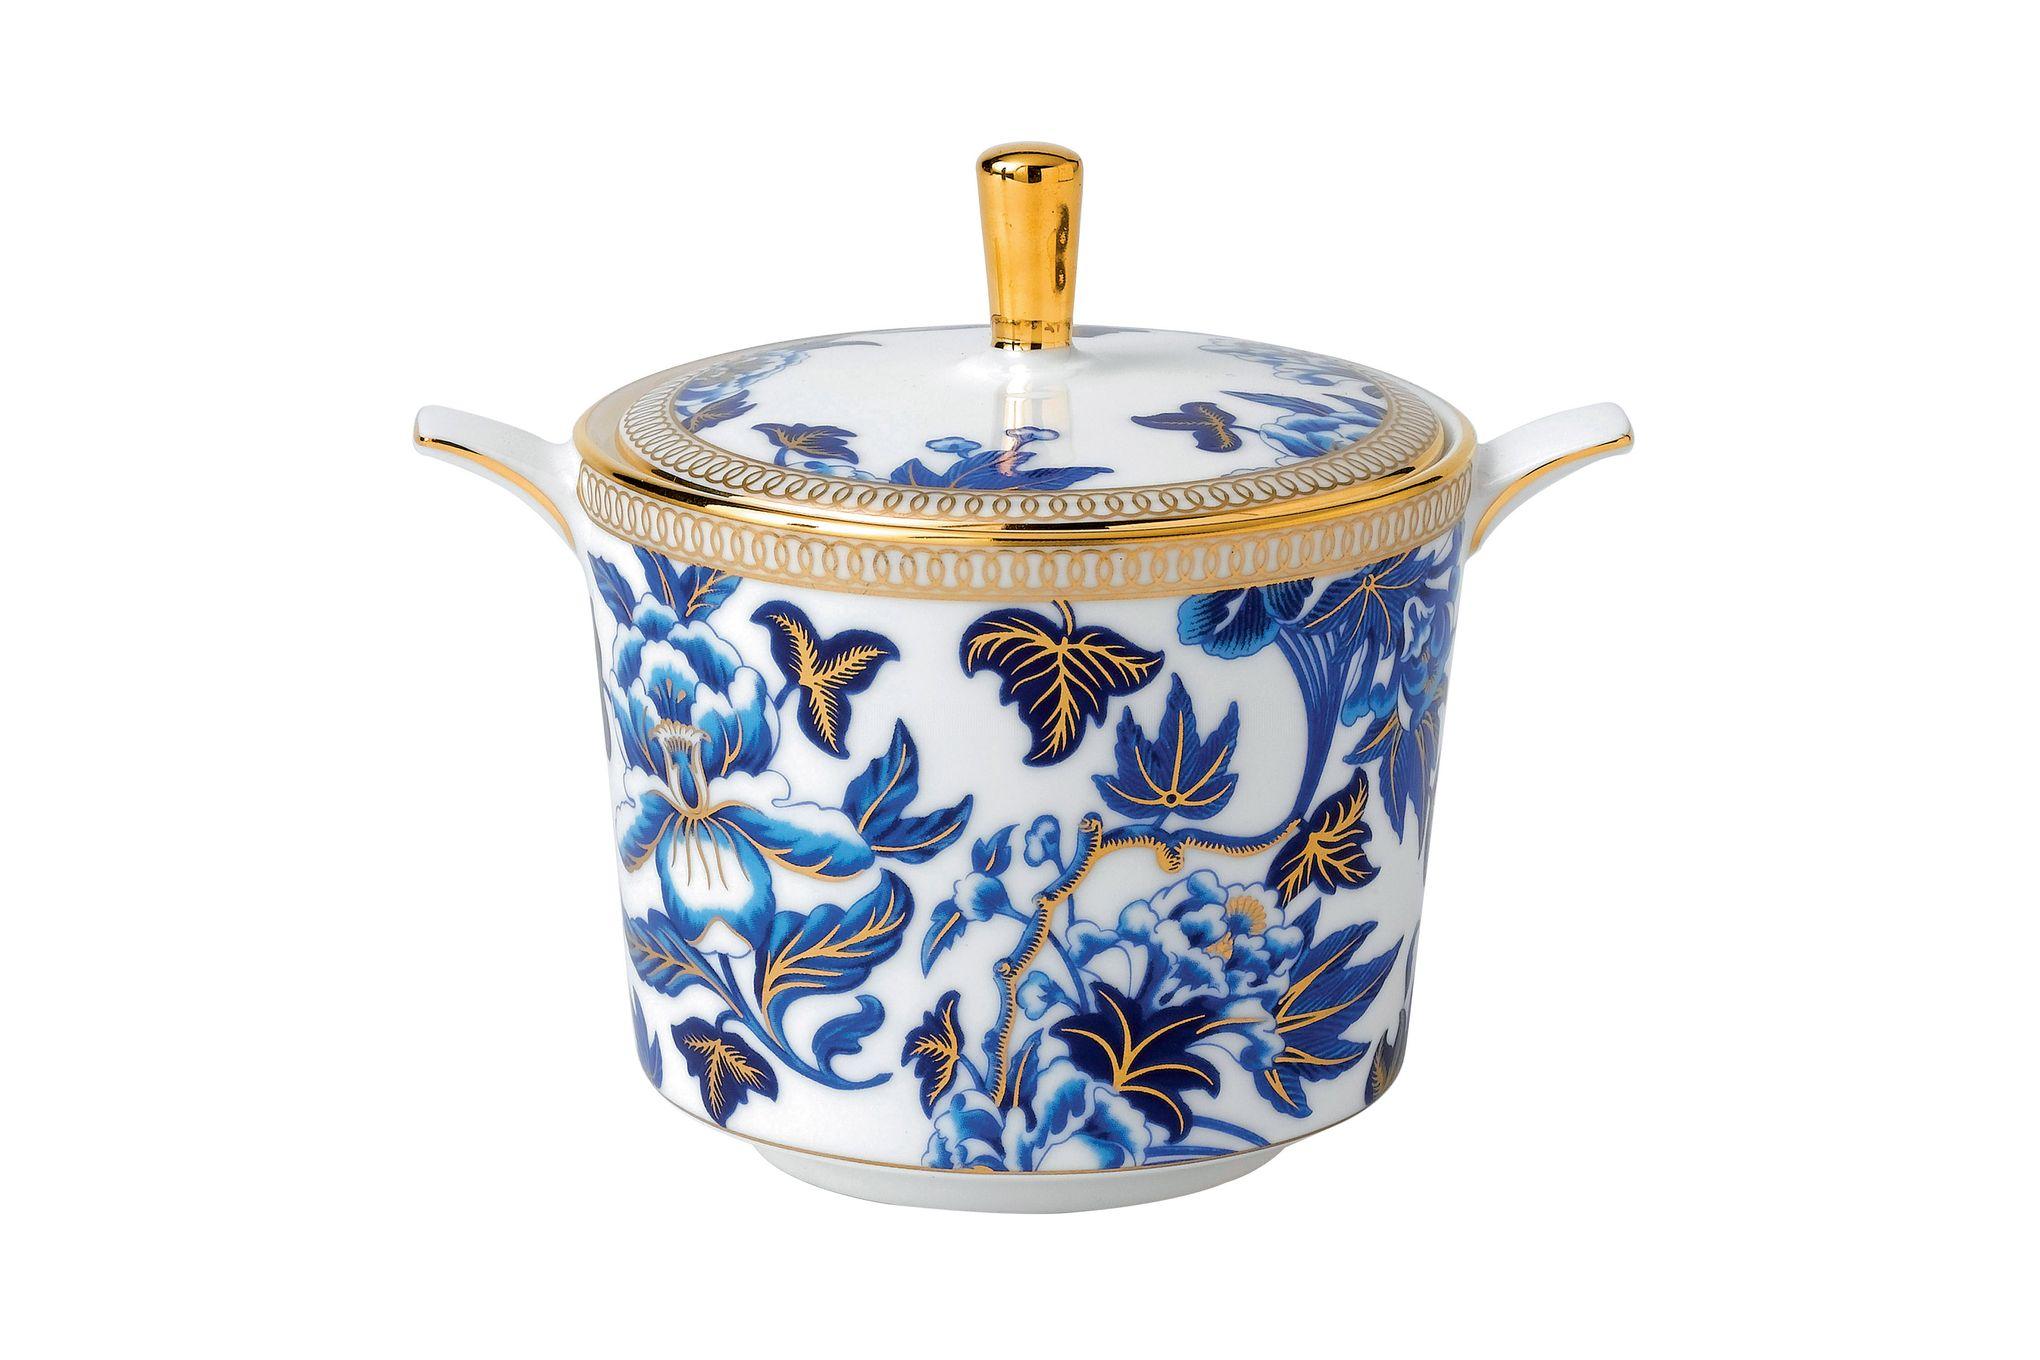 Wedgwood Hibiscus Sugar Bowl - Lidded (Tea) thumb 1